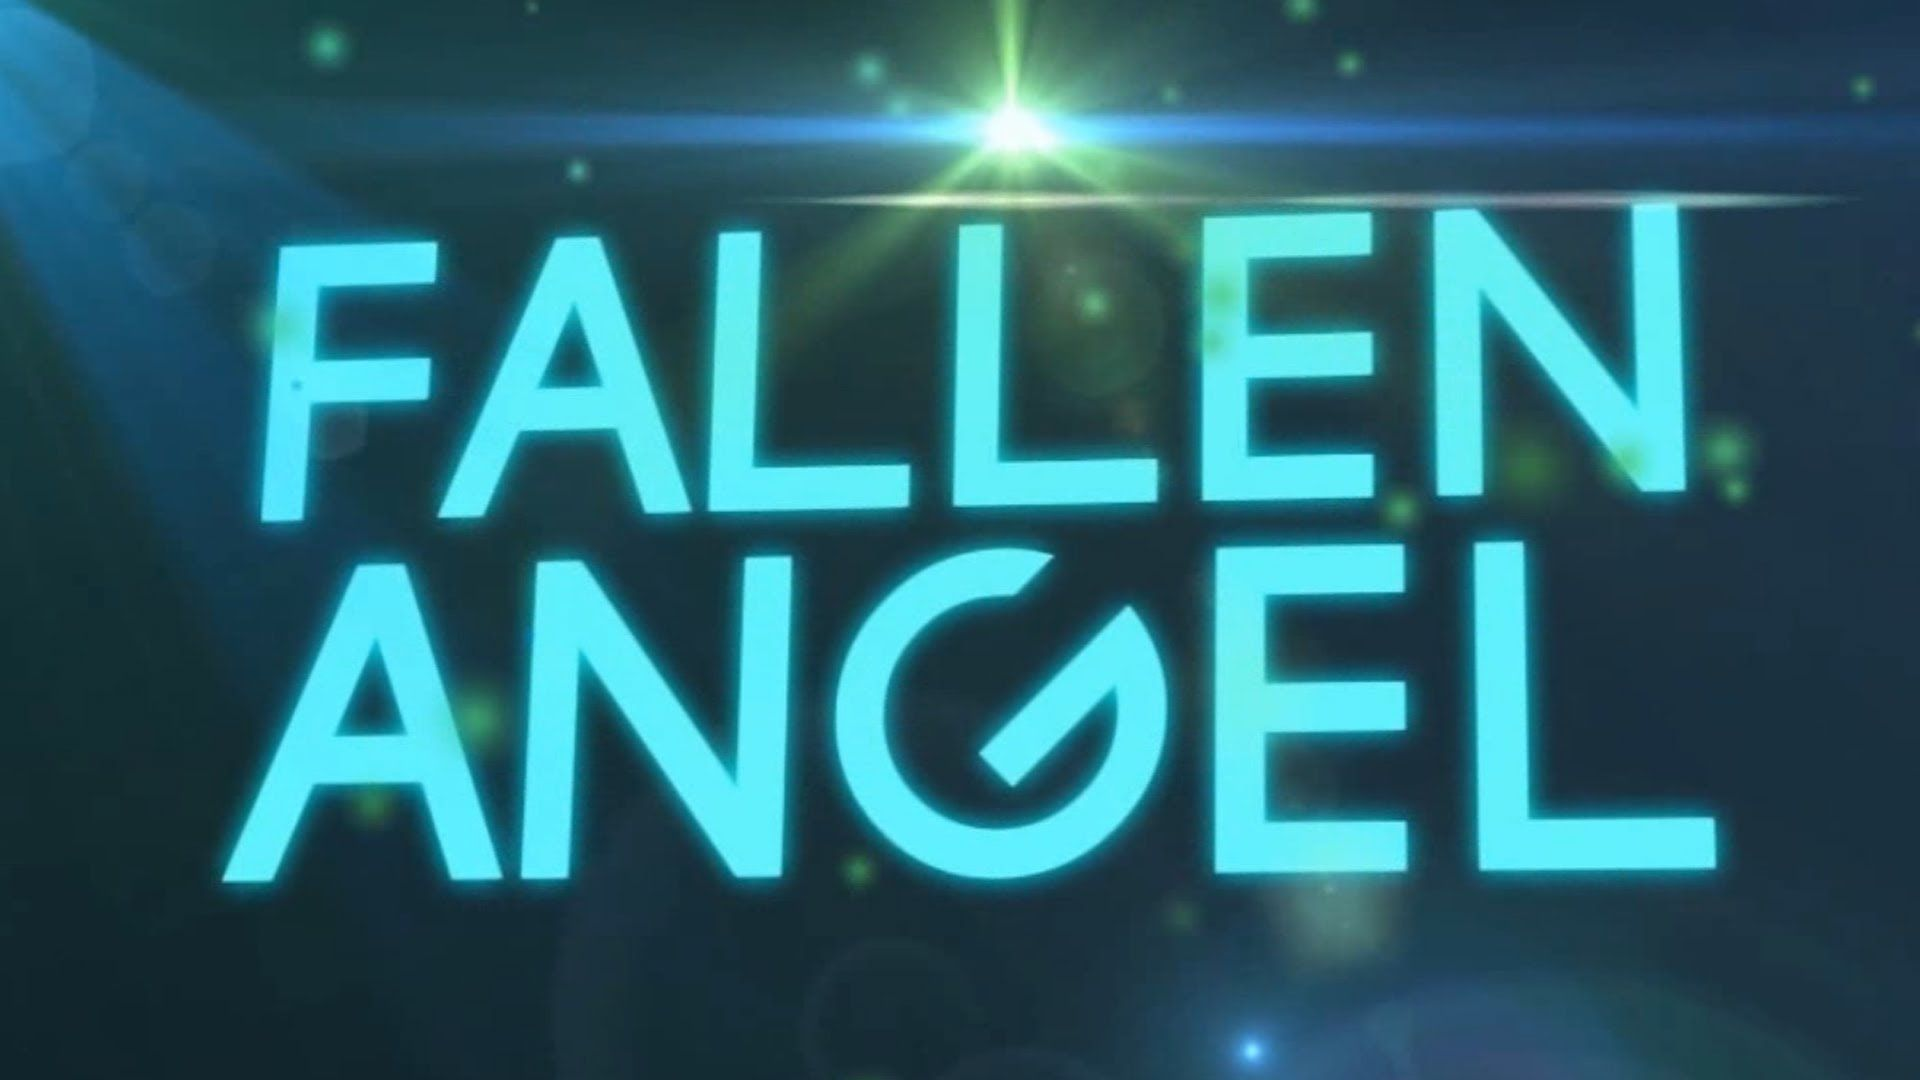 J-Hype - Fallen Angel (Official Lyric Video) - YouTube